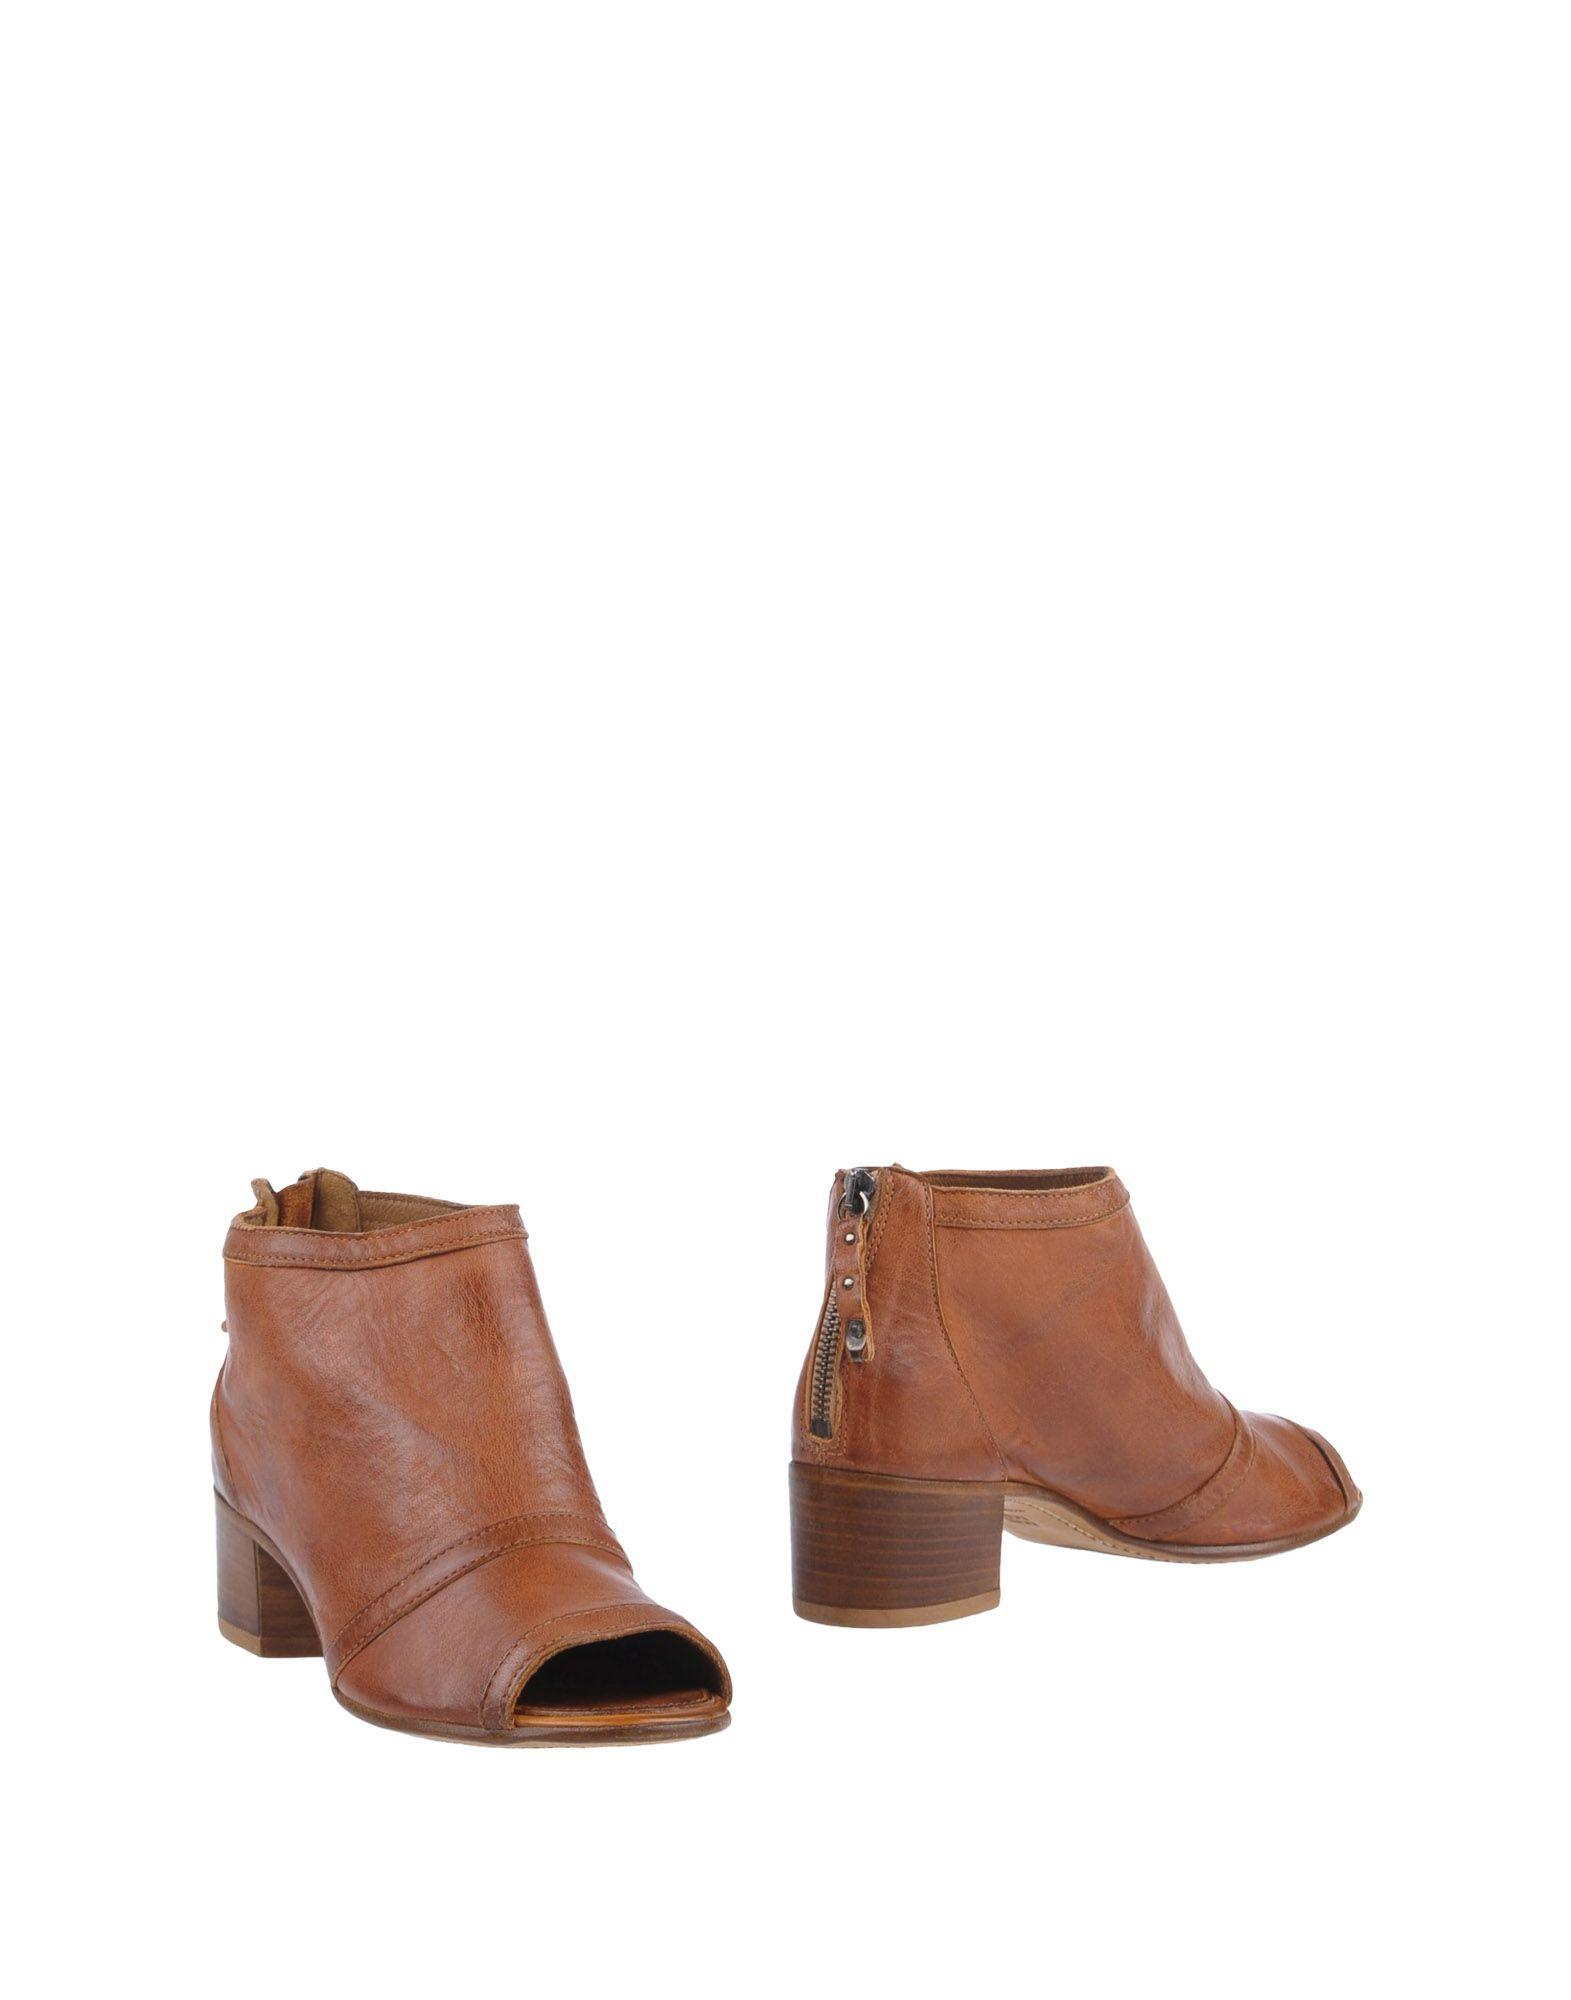 Stilvolle billige Schuhe Damen Moma Stiefelette Damen Schuhe  11326277CW 0b4307